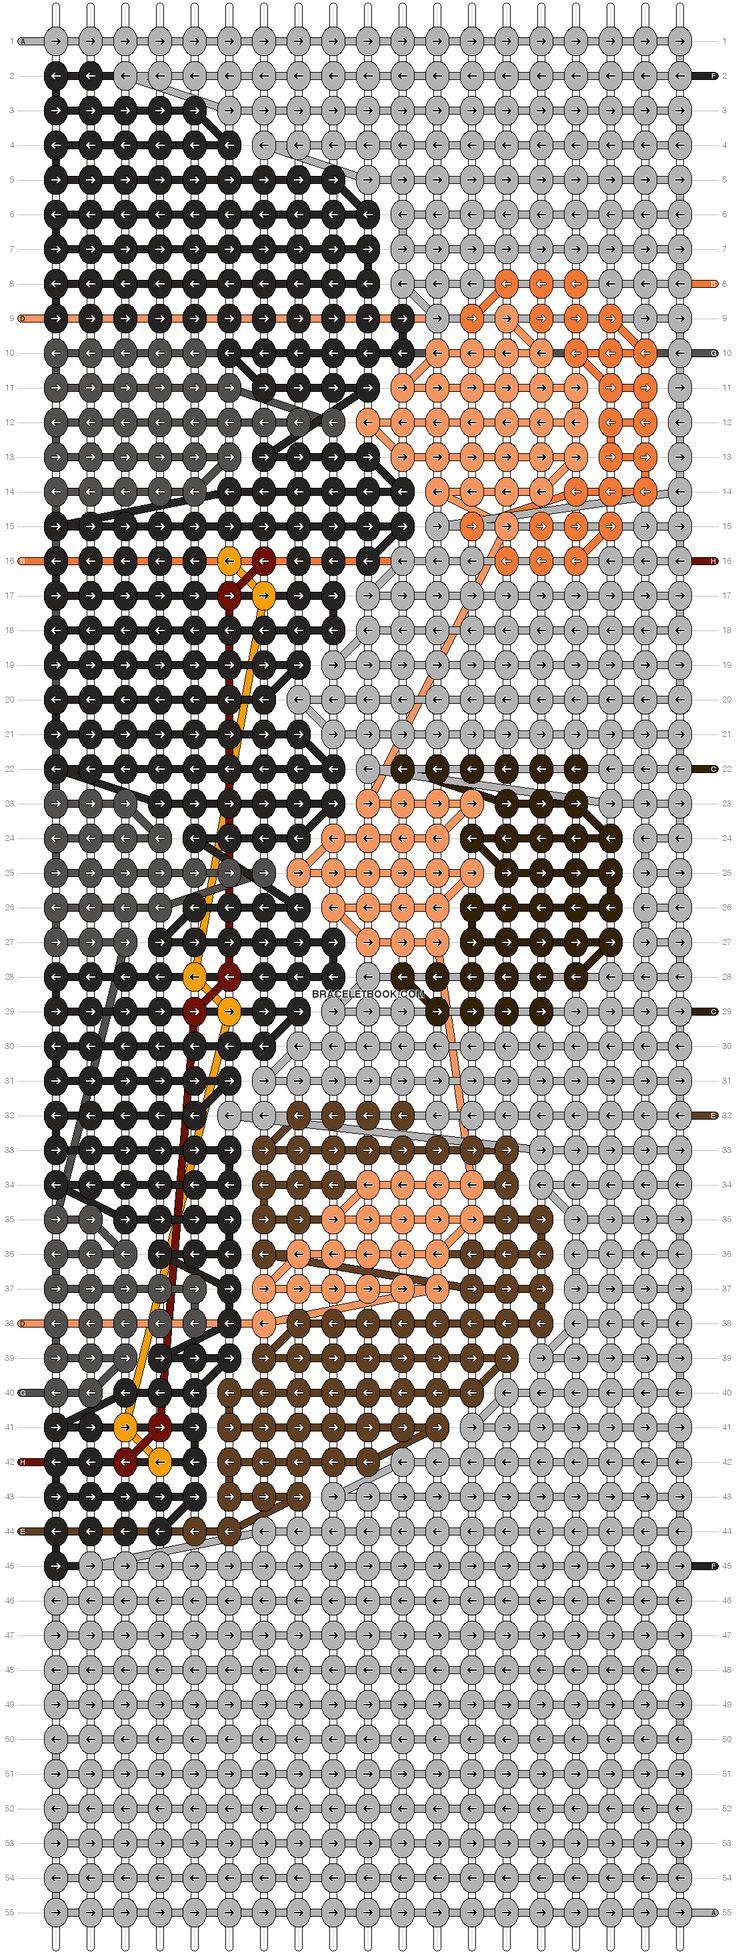 Alpha Pattern #13068 added by lovevball